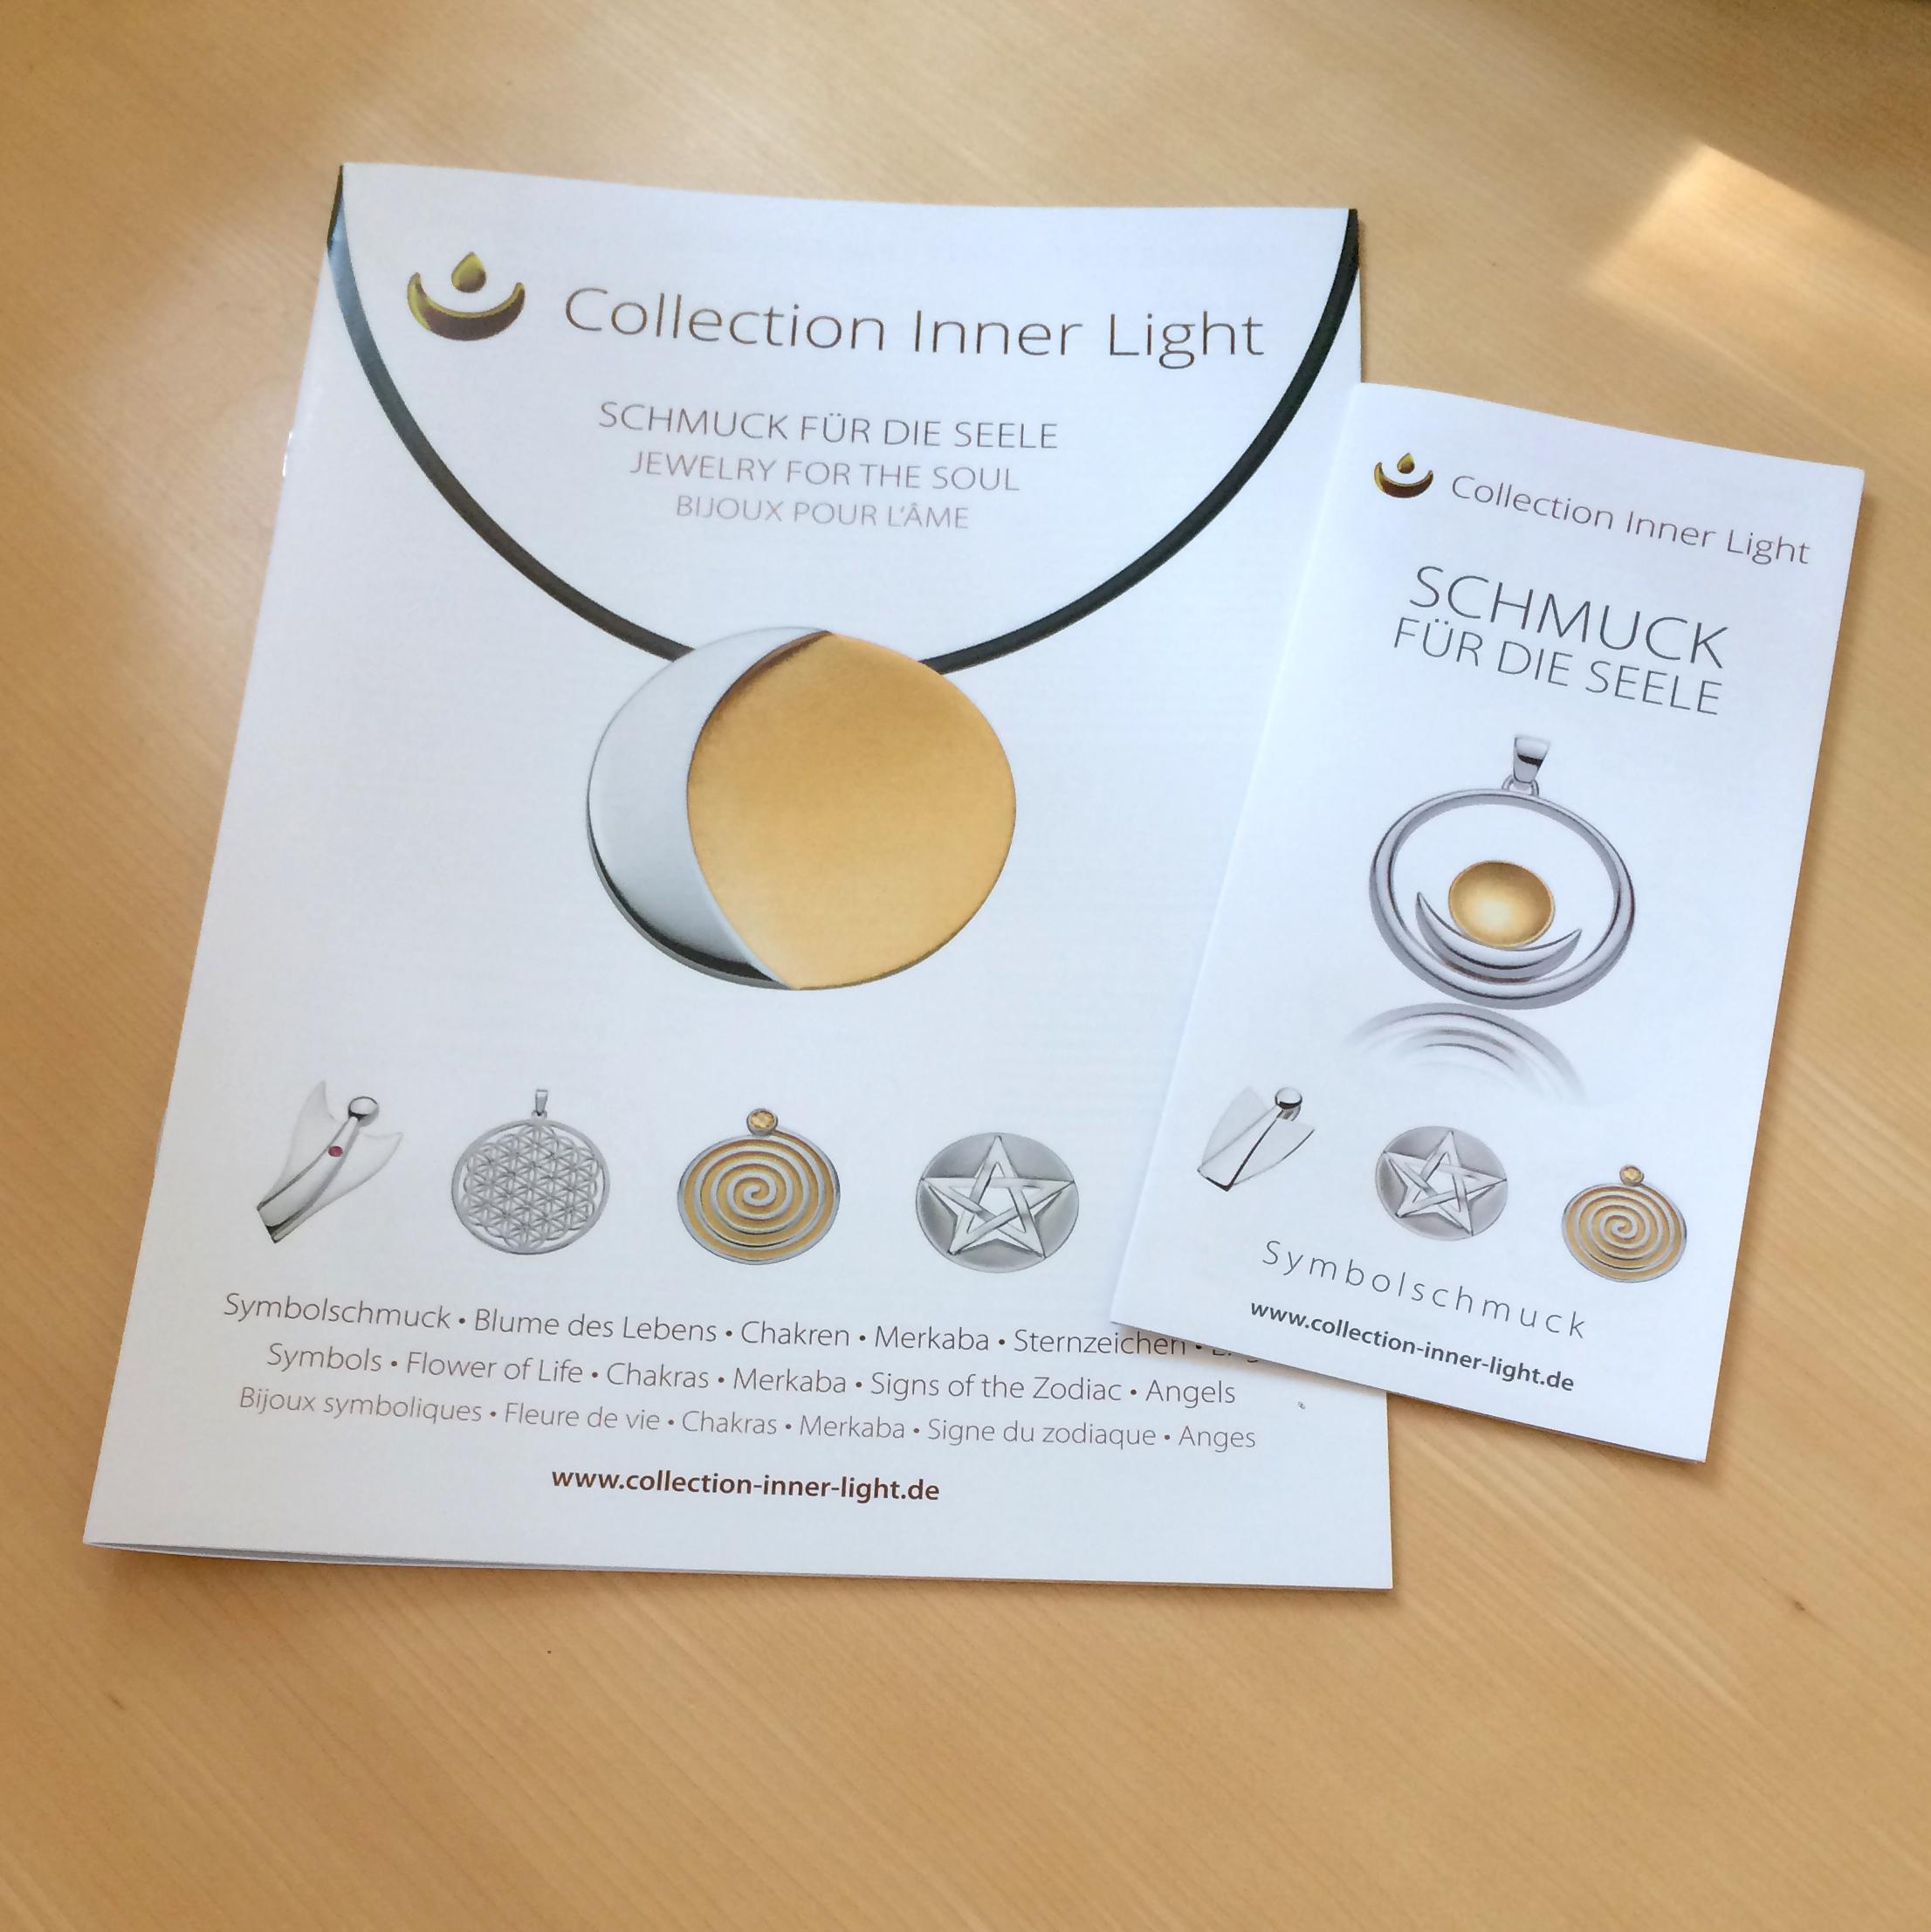 collection inner light katalog flyer werbung anzeige fontfront rossdorf 1